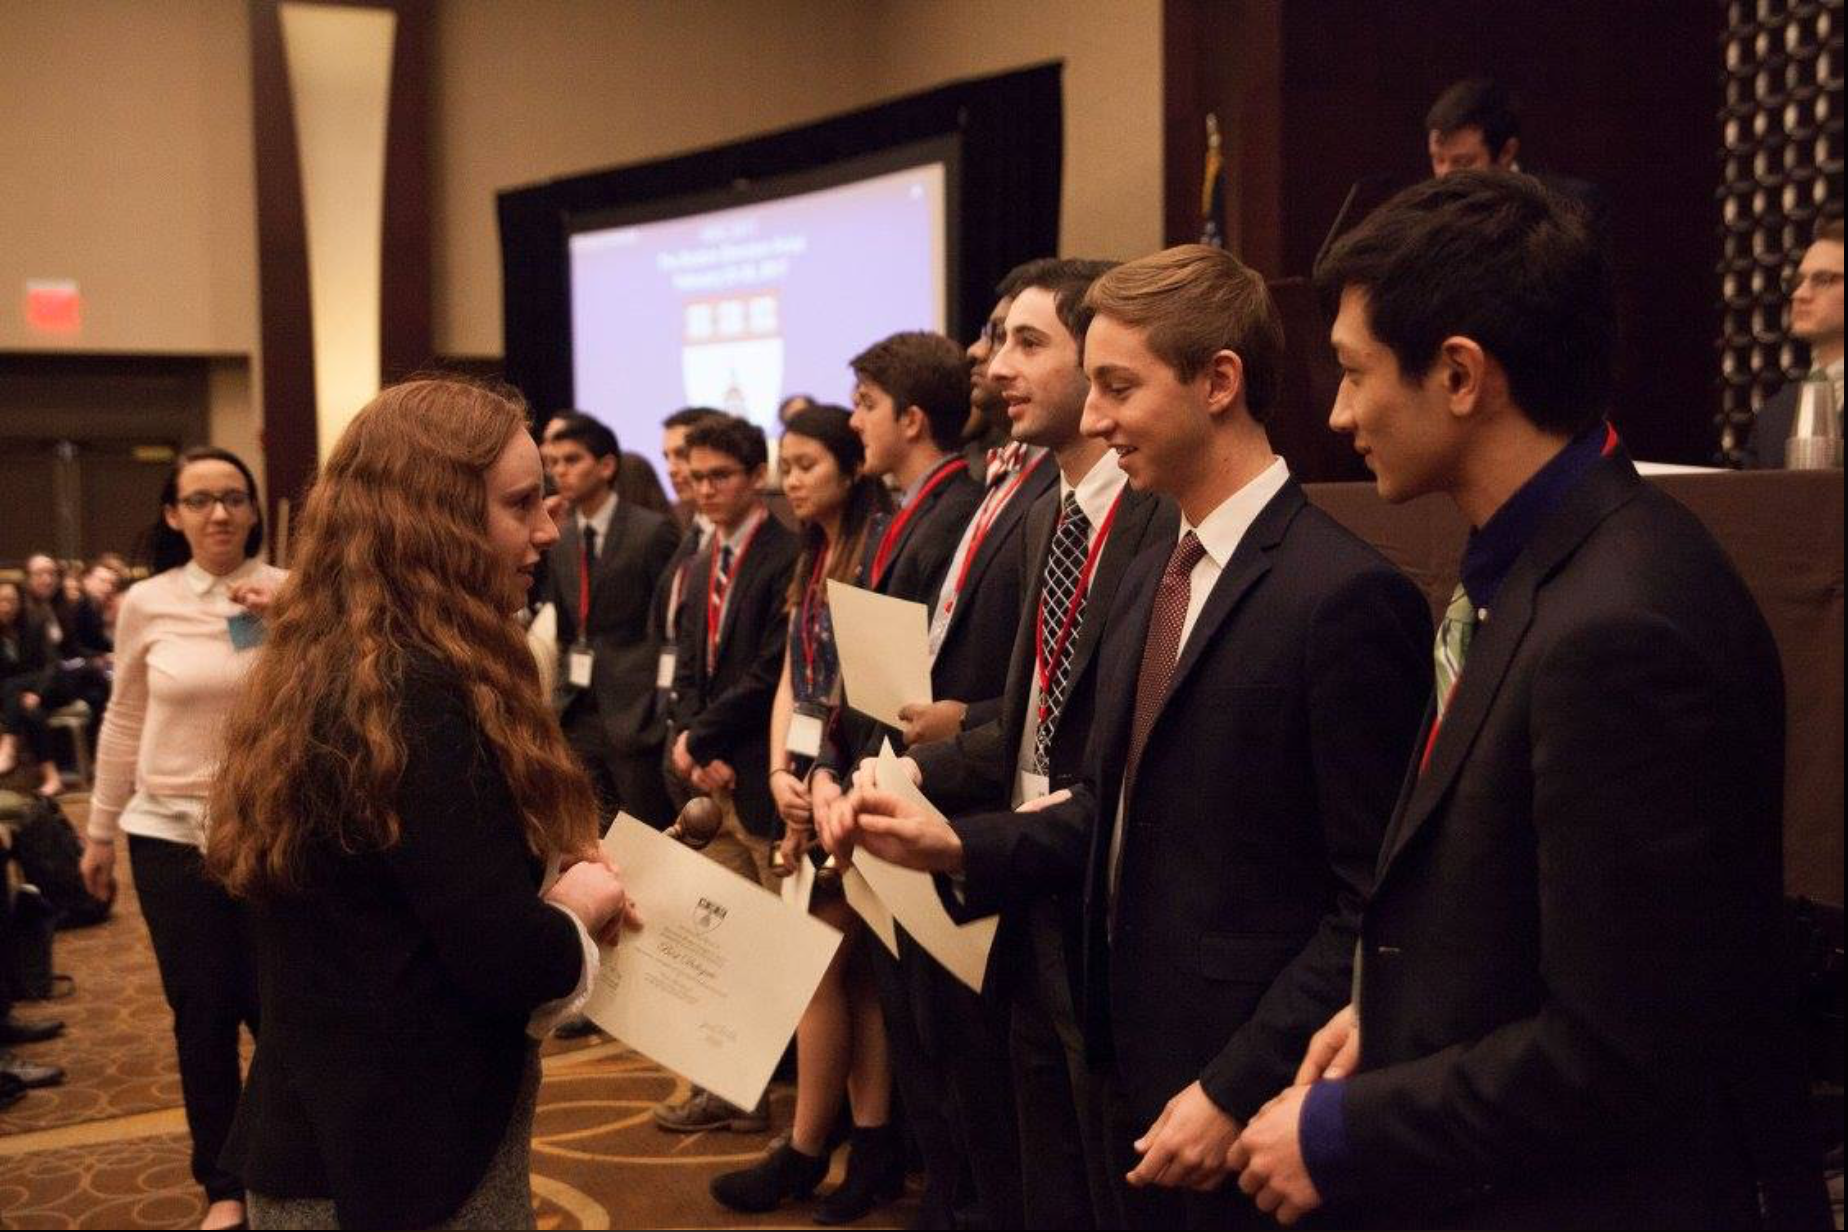 Members of Harvard Model Congress lead an awards ceremony.